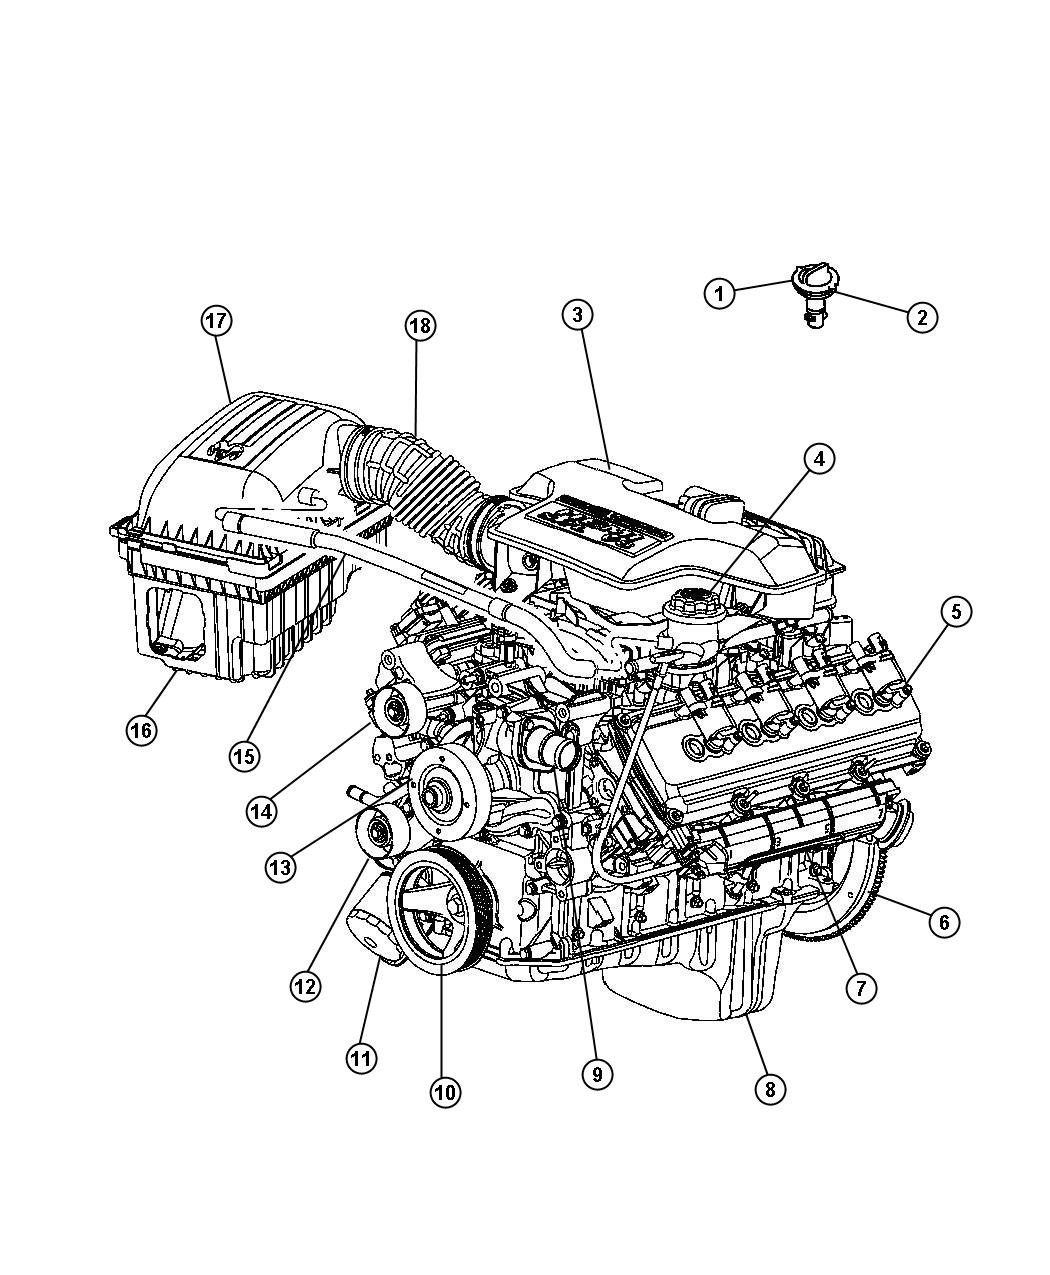 2011 Jeep Patriot Pulley. Idler. Engine, alternator